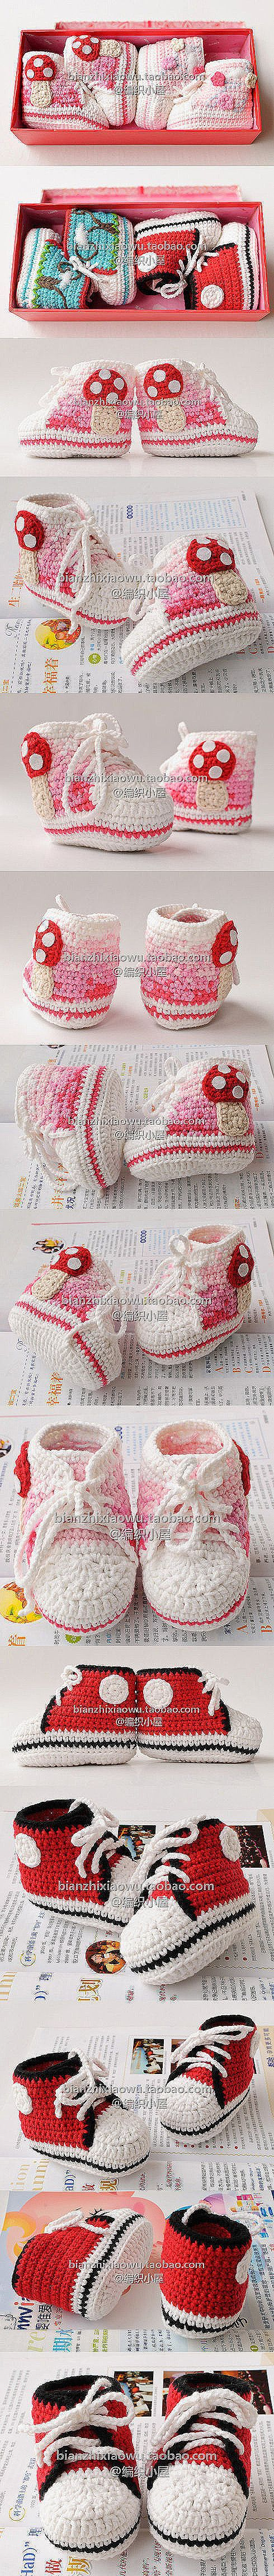 "http://www.aliexpress.com/store/1687168 cute booties inspiration and similar PDF crochet pattern ""free!"""